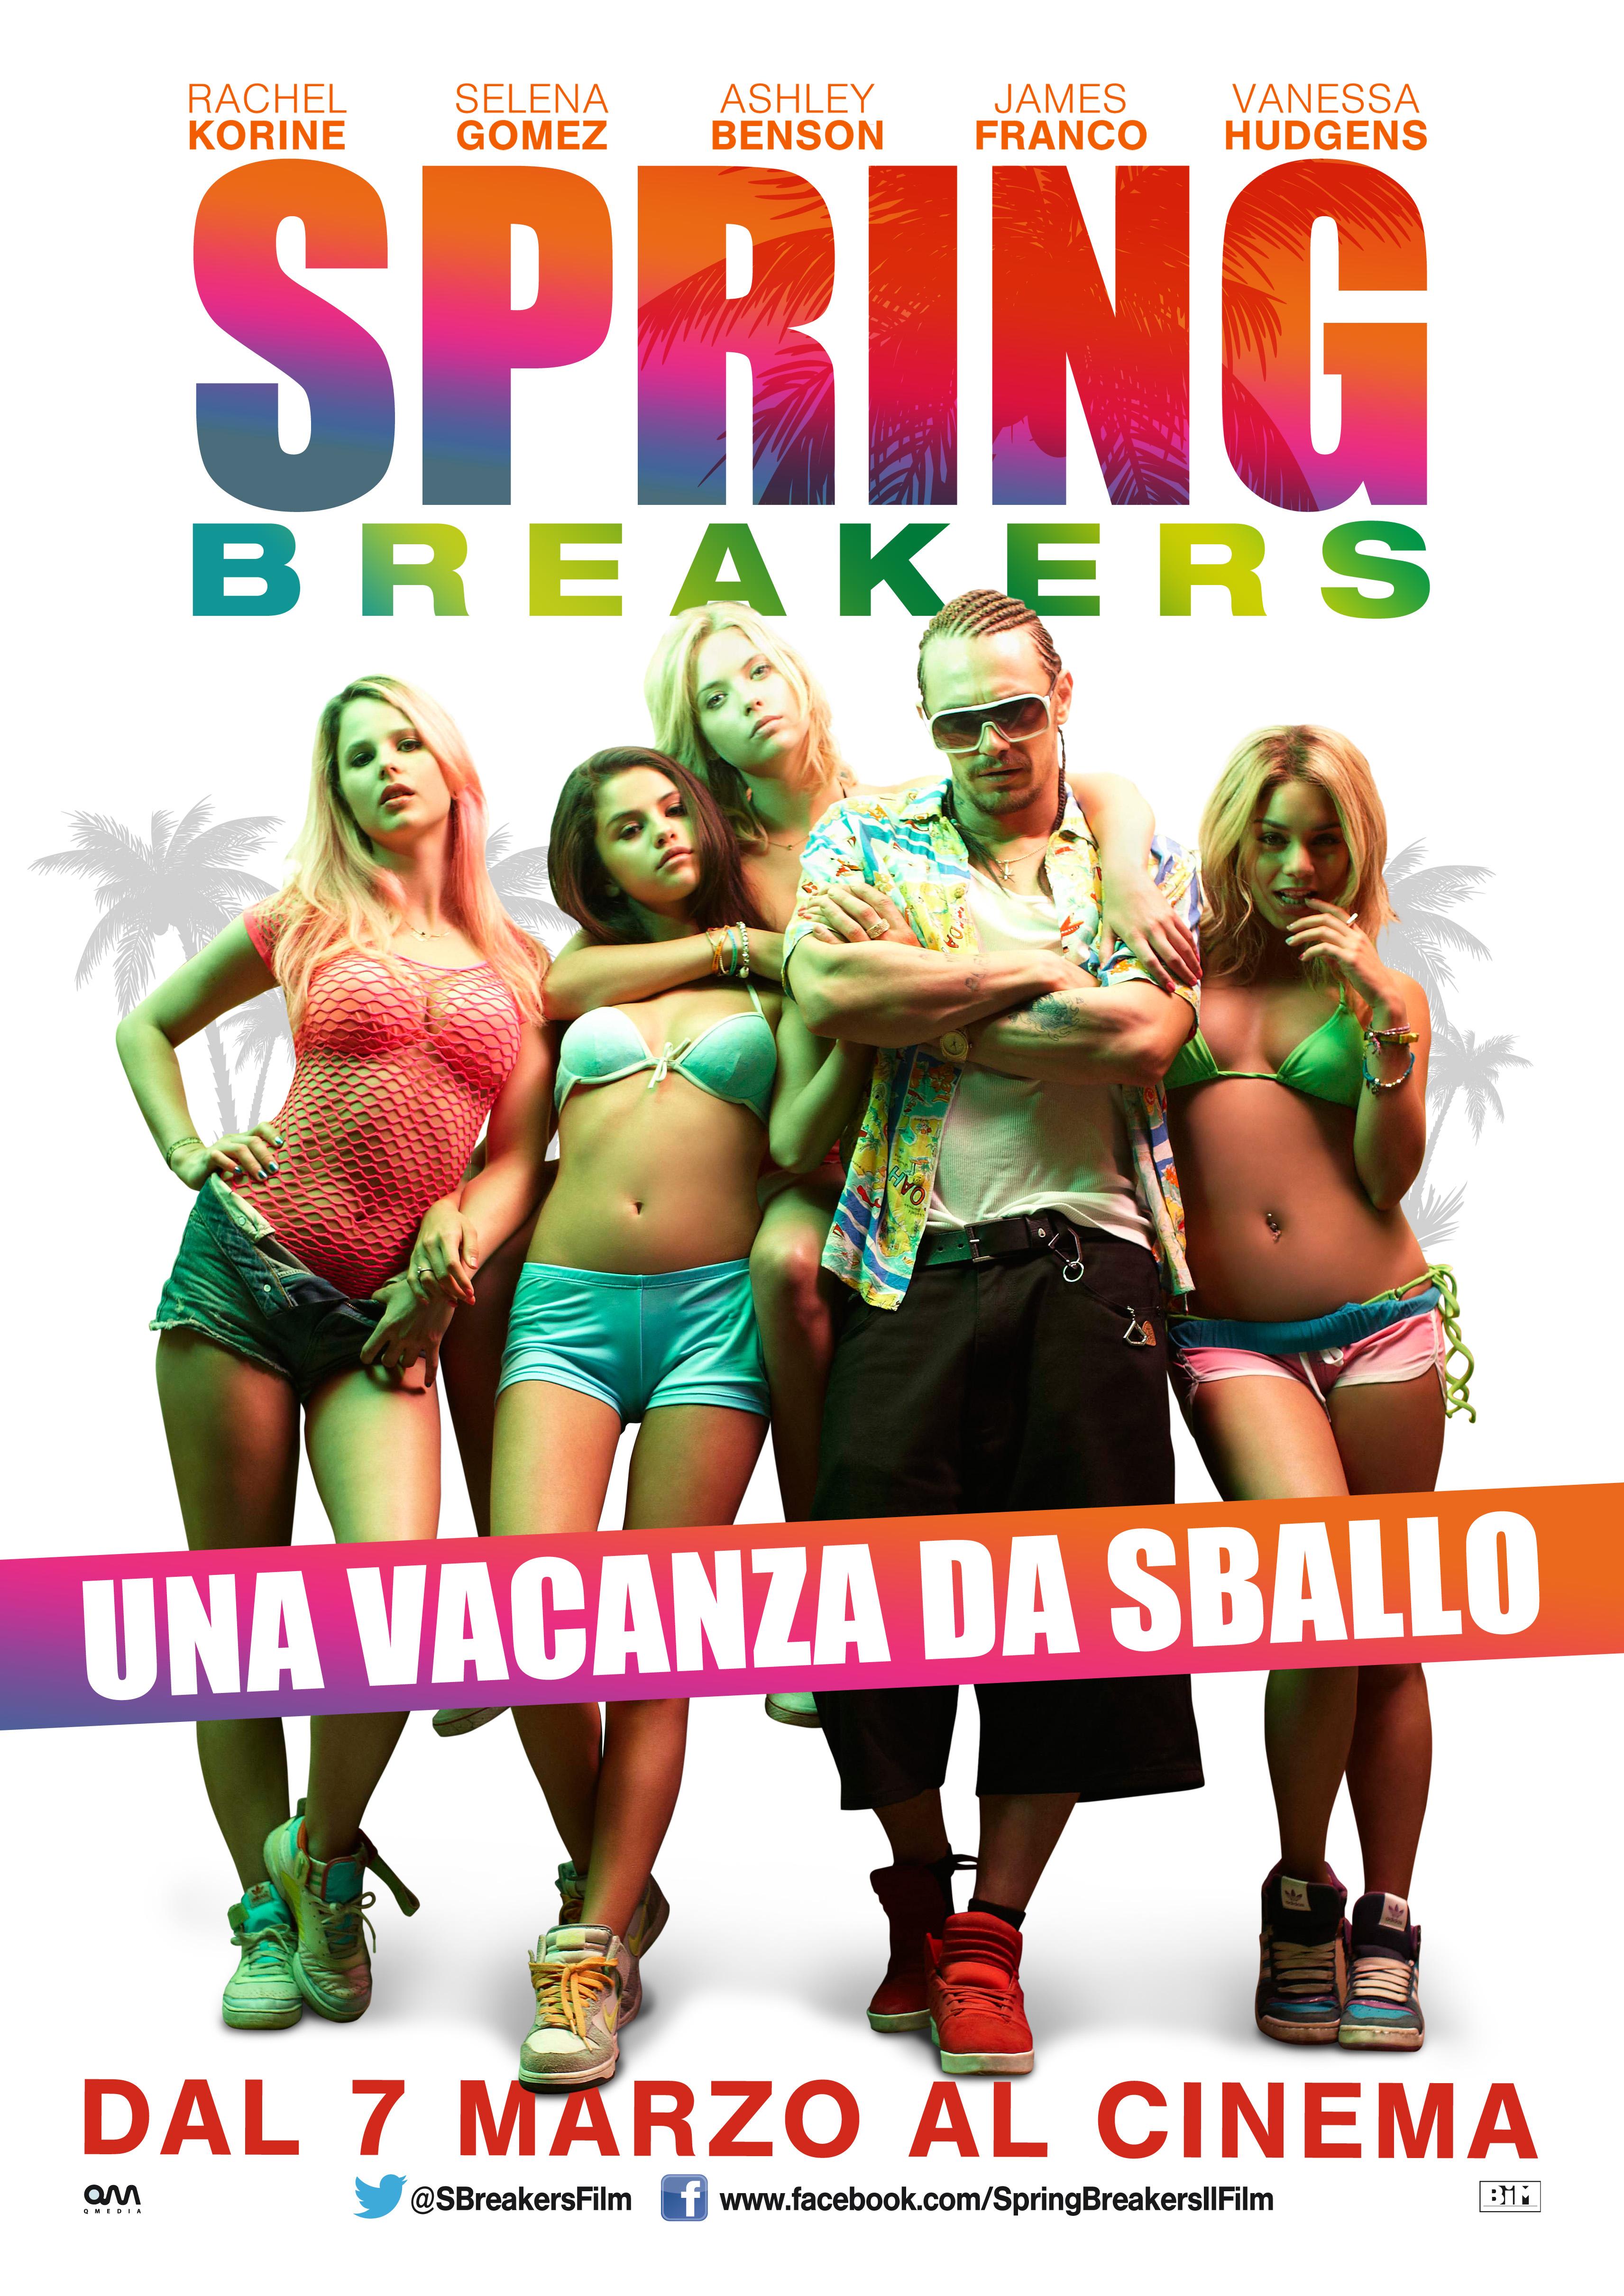 Spring Breakers - Movie Poster #13 (Original)